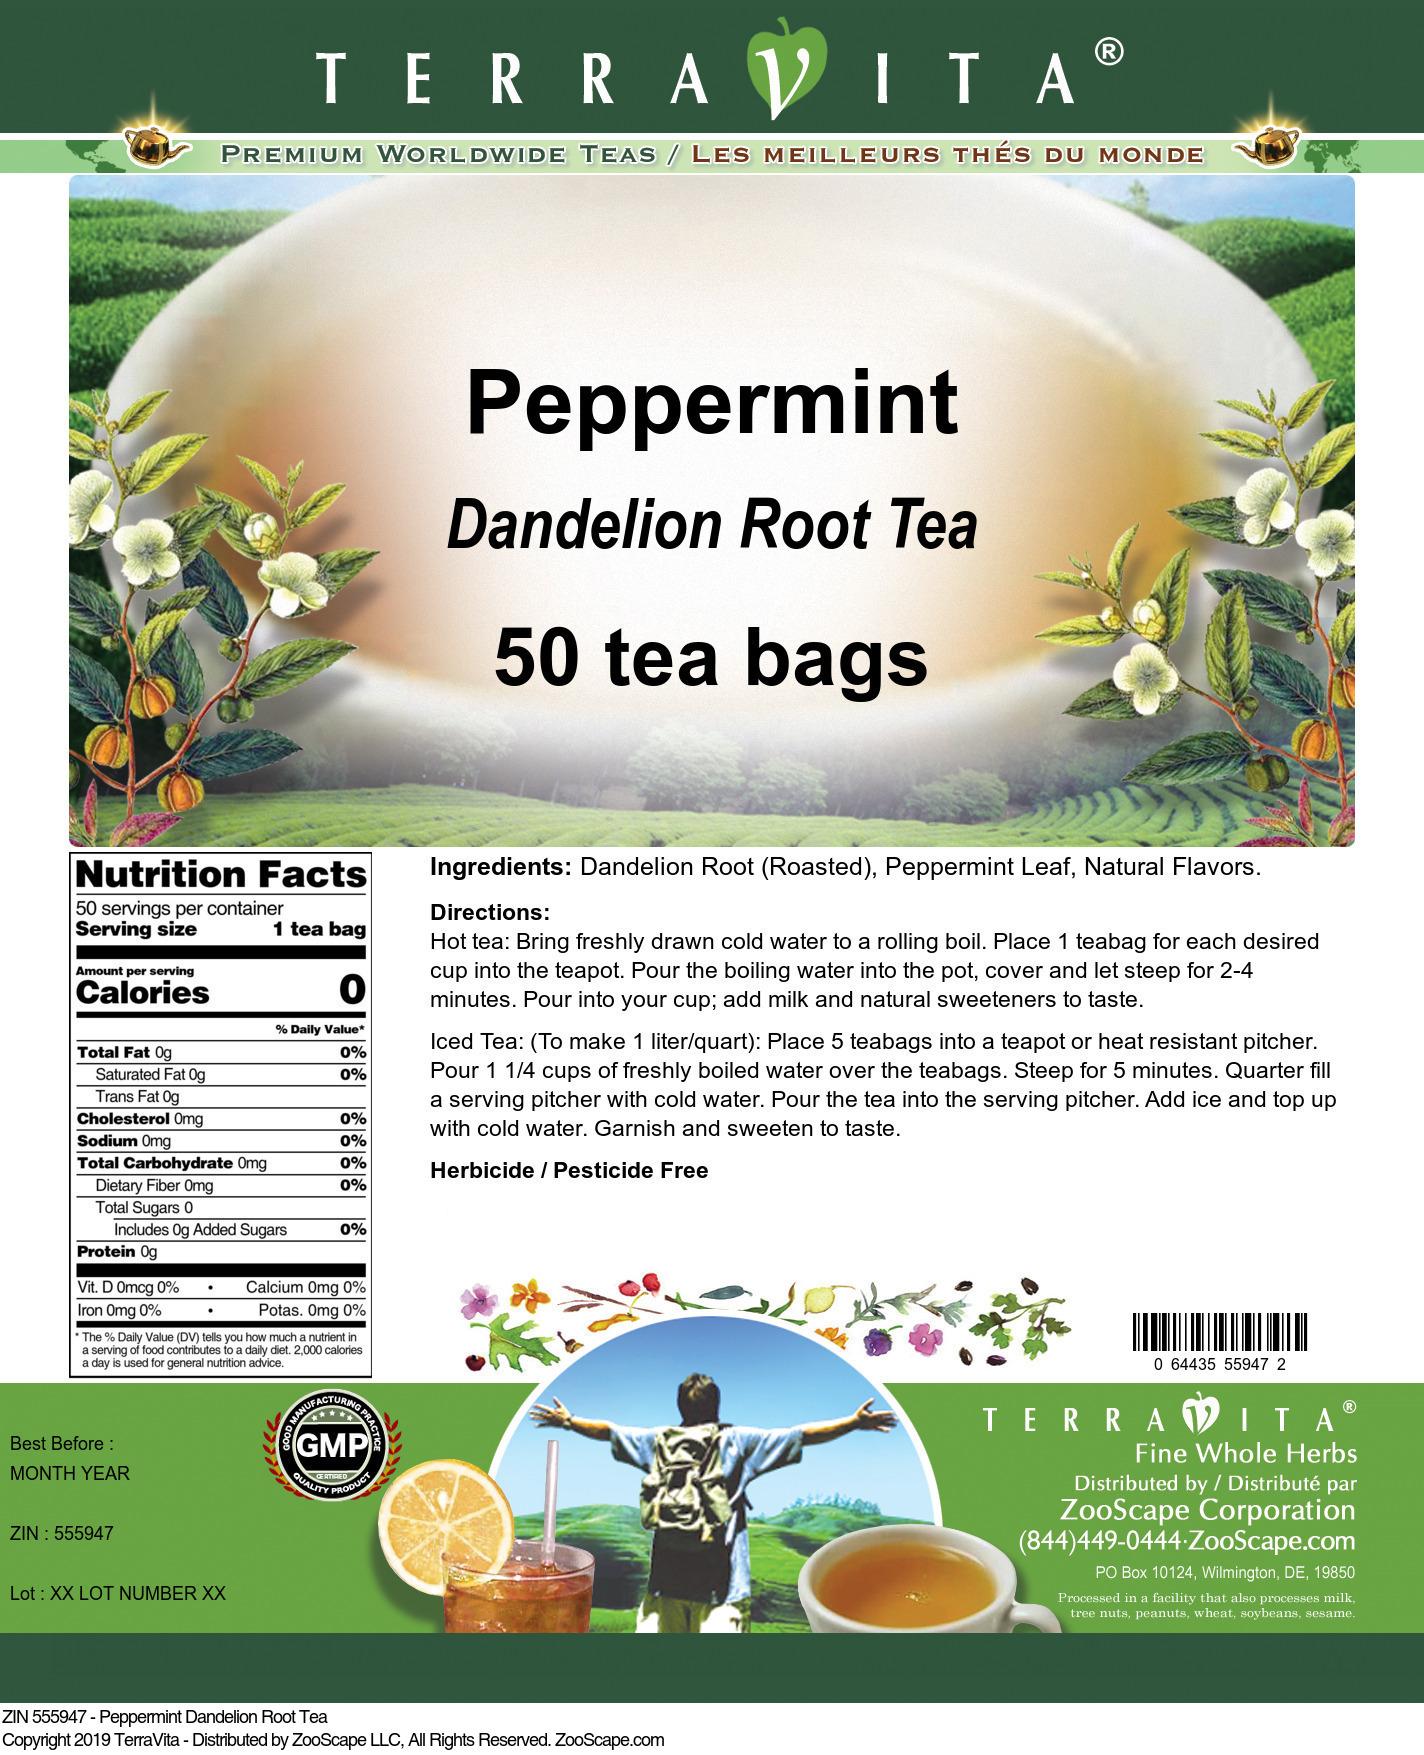 Peppermint Dandelion Root